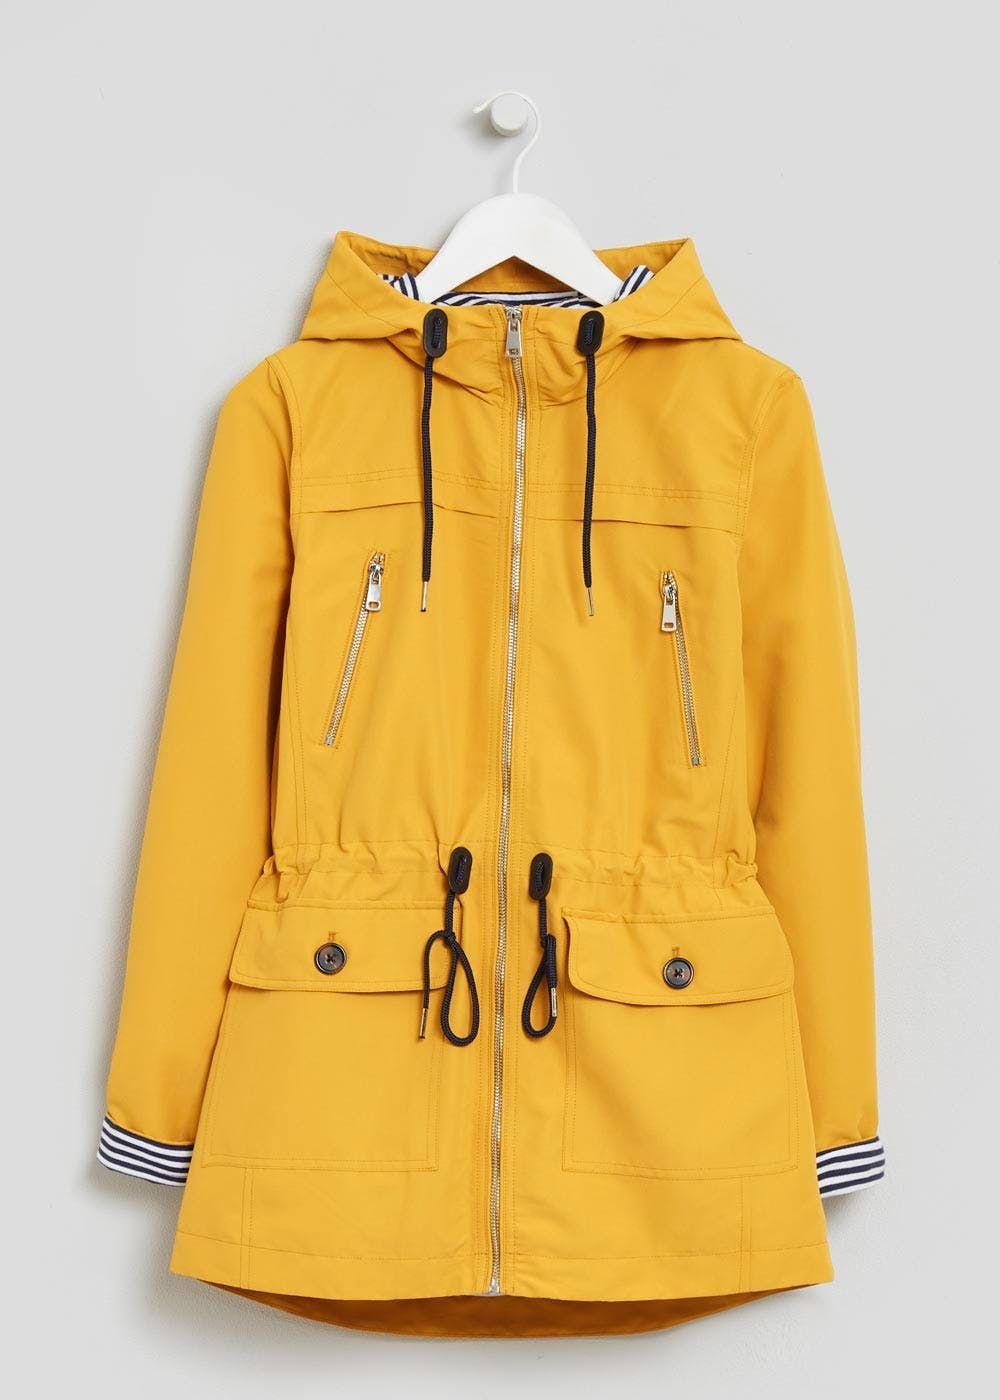 d7f912335 Preppy Jacket   Style (Owned)   Jackets, Preppy, Mustard